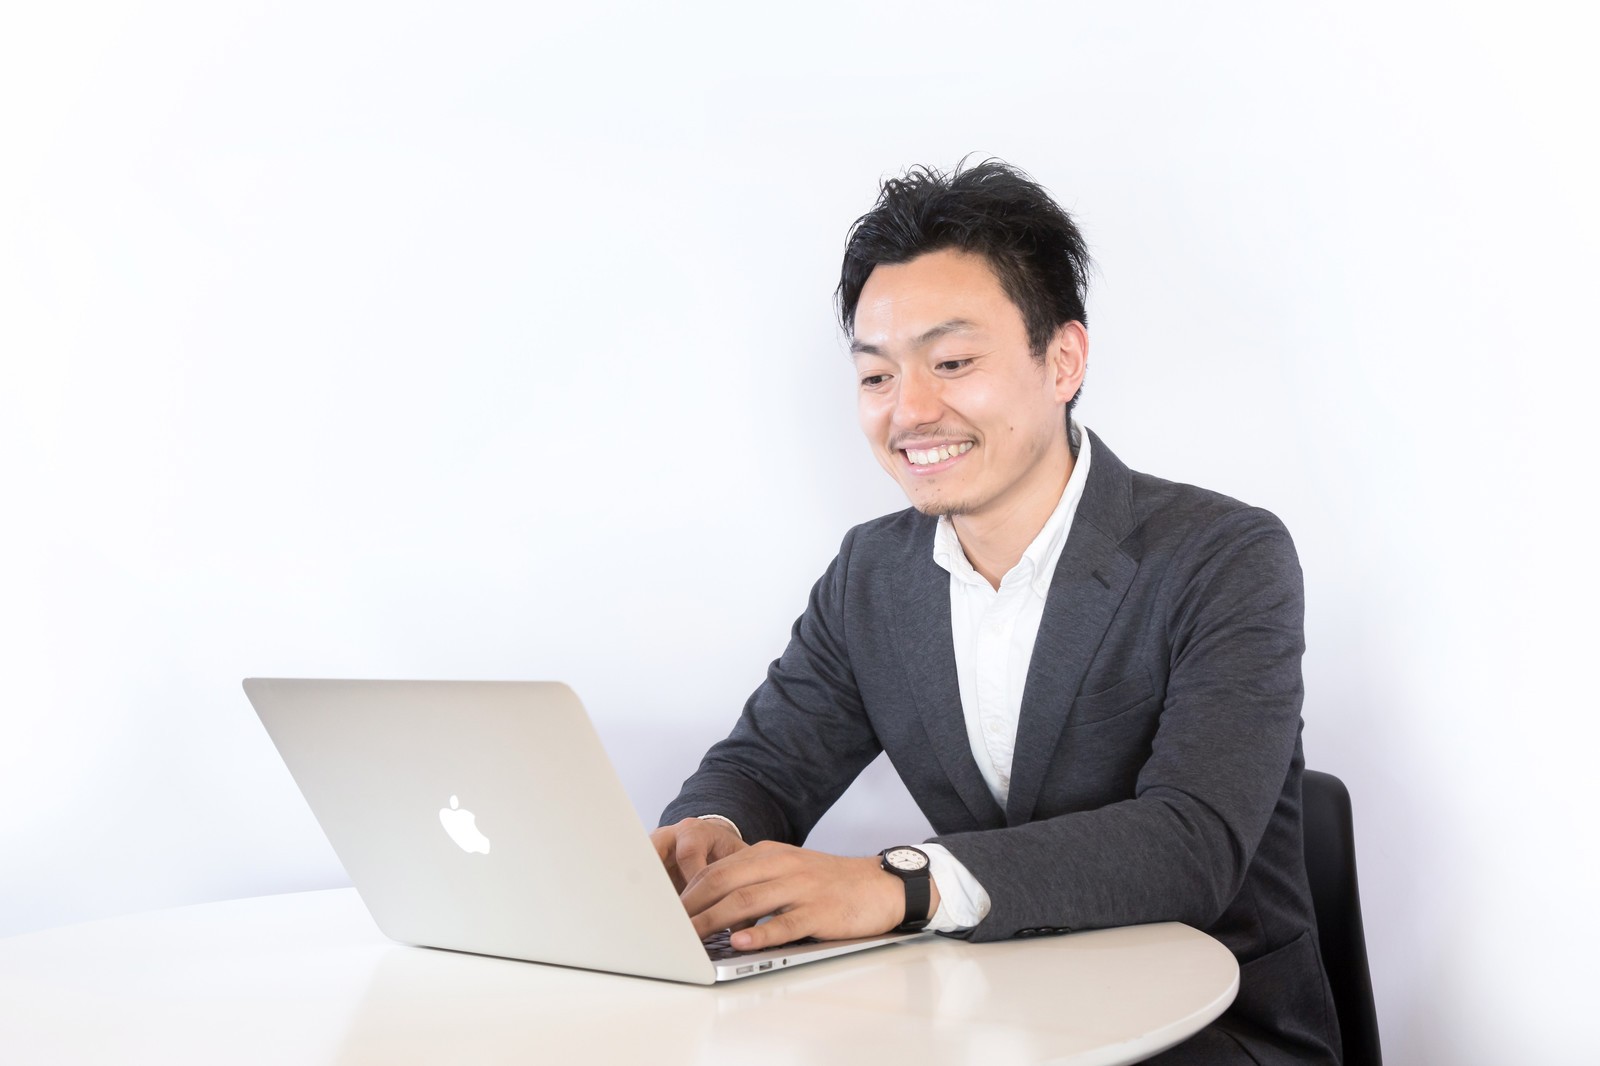 【Webアプリケーションエンジニア】神戸市中央区勤務です!